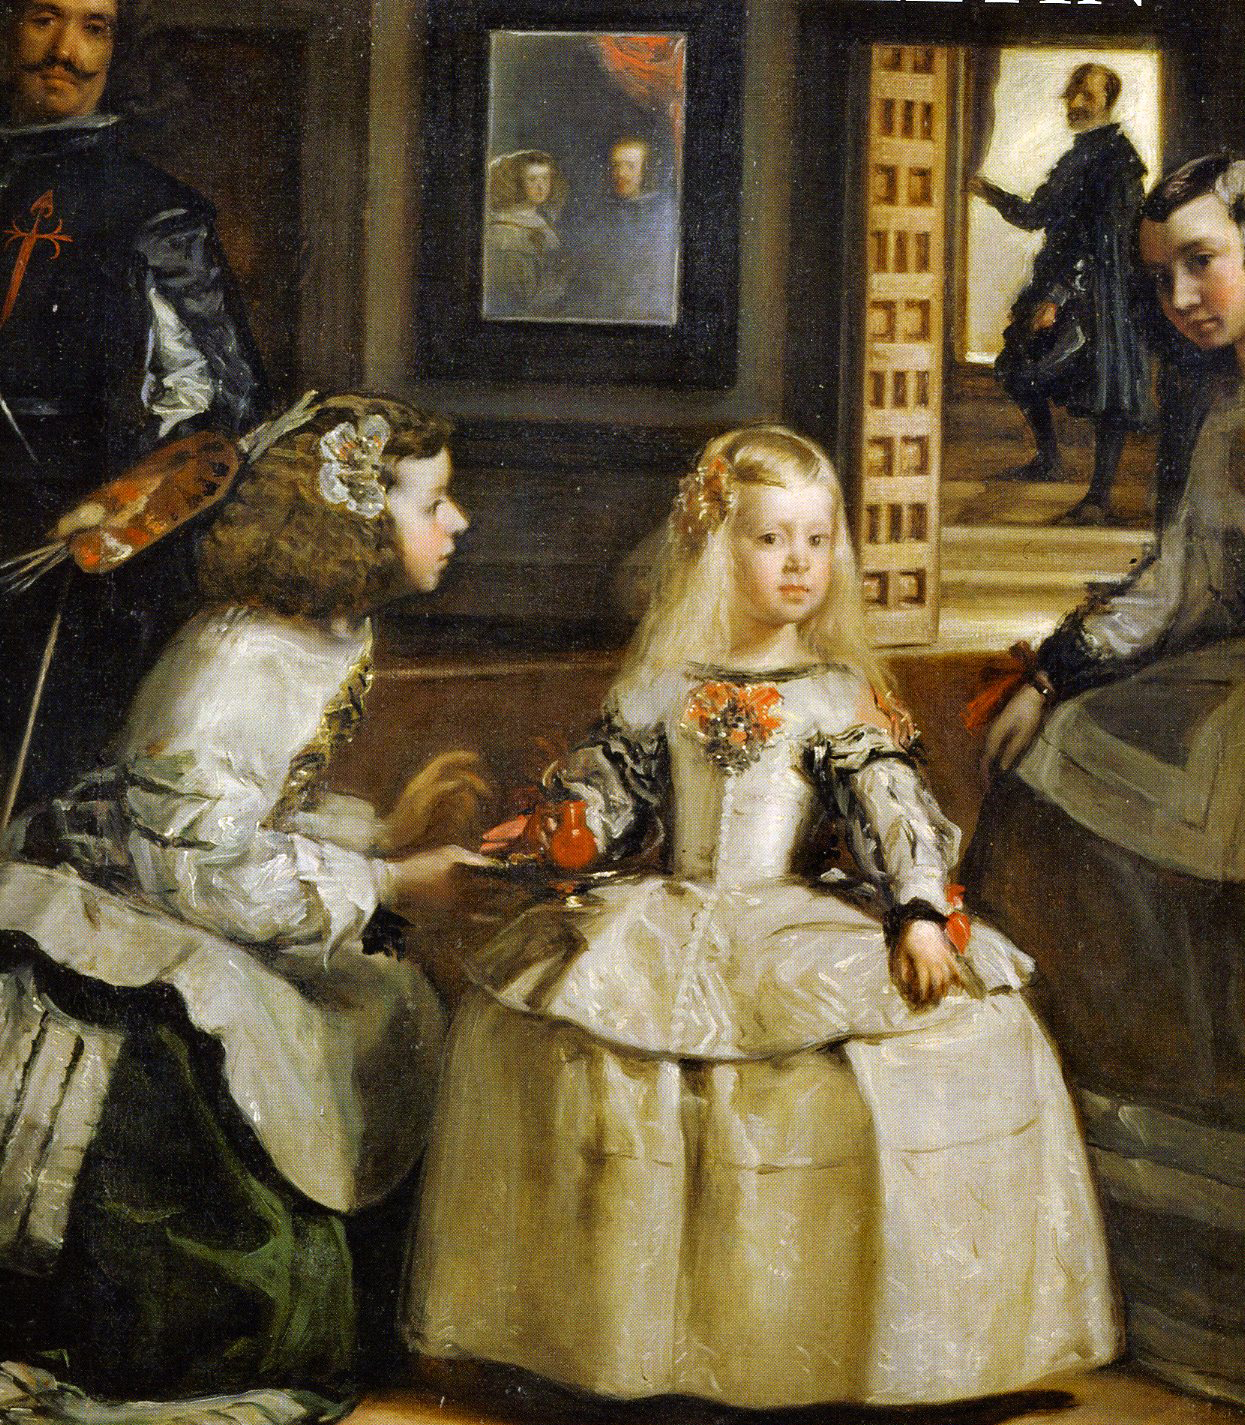 an analysis of las meninas by diego velzquez